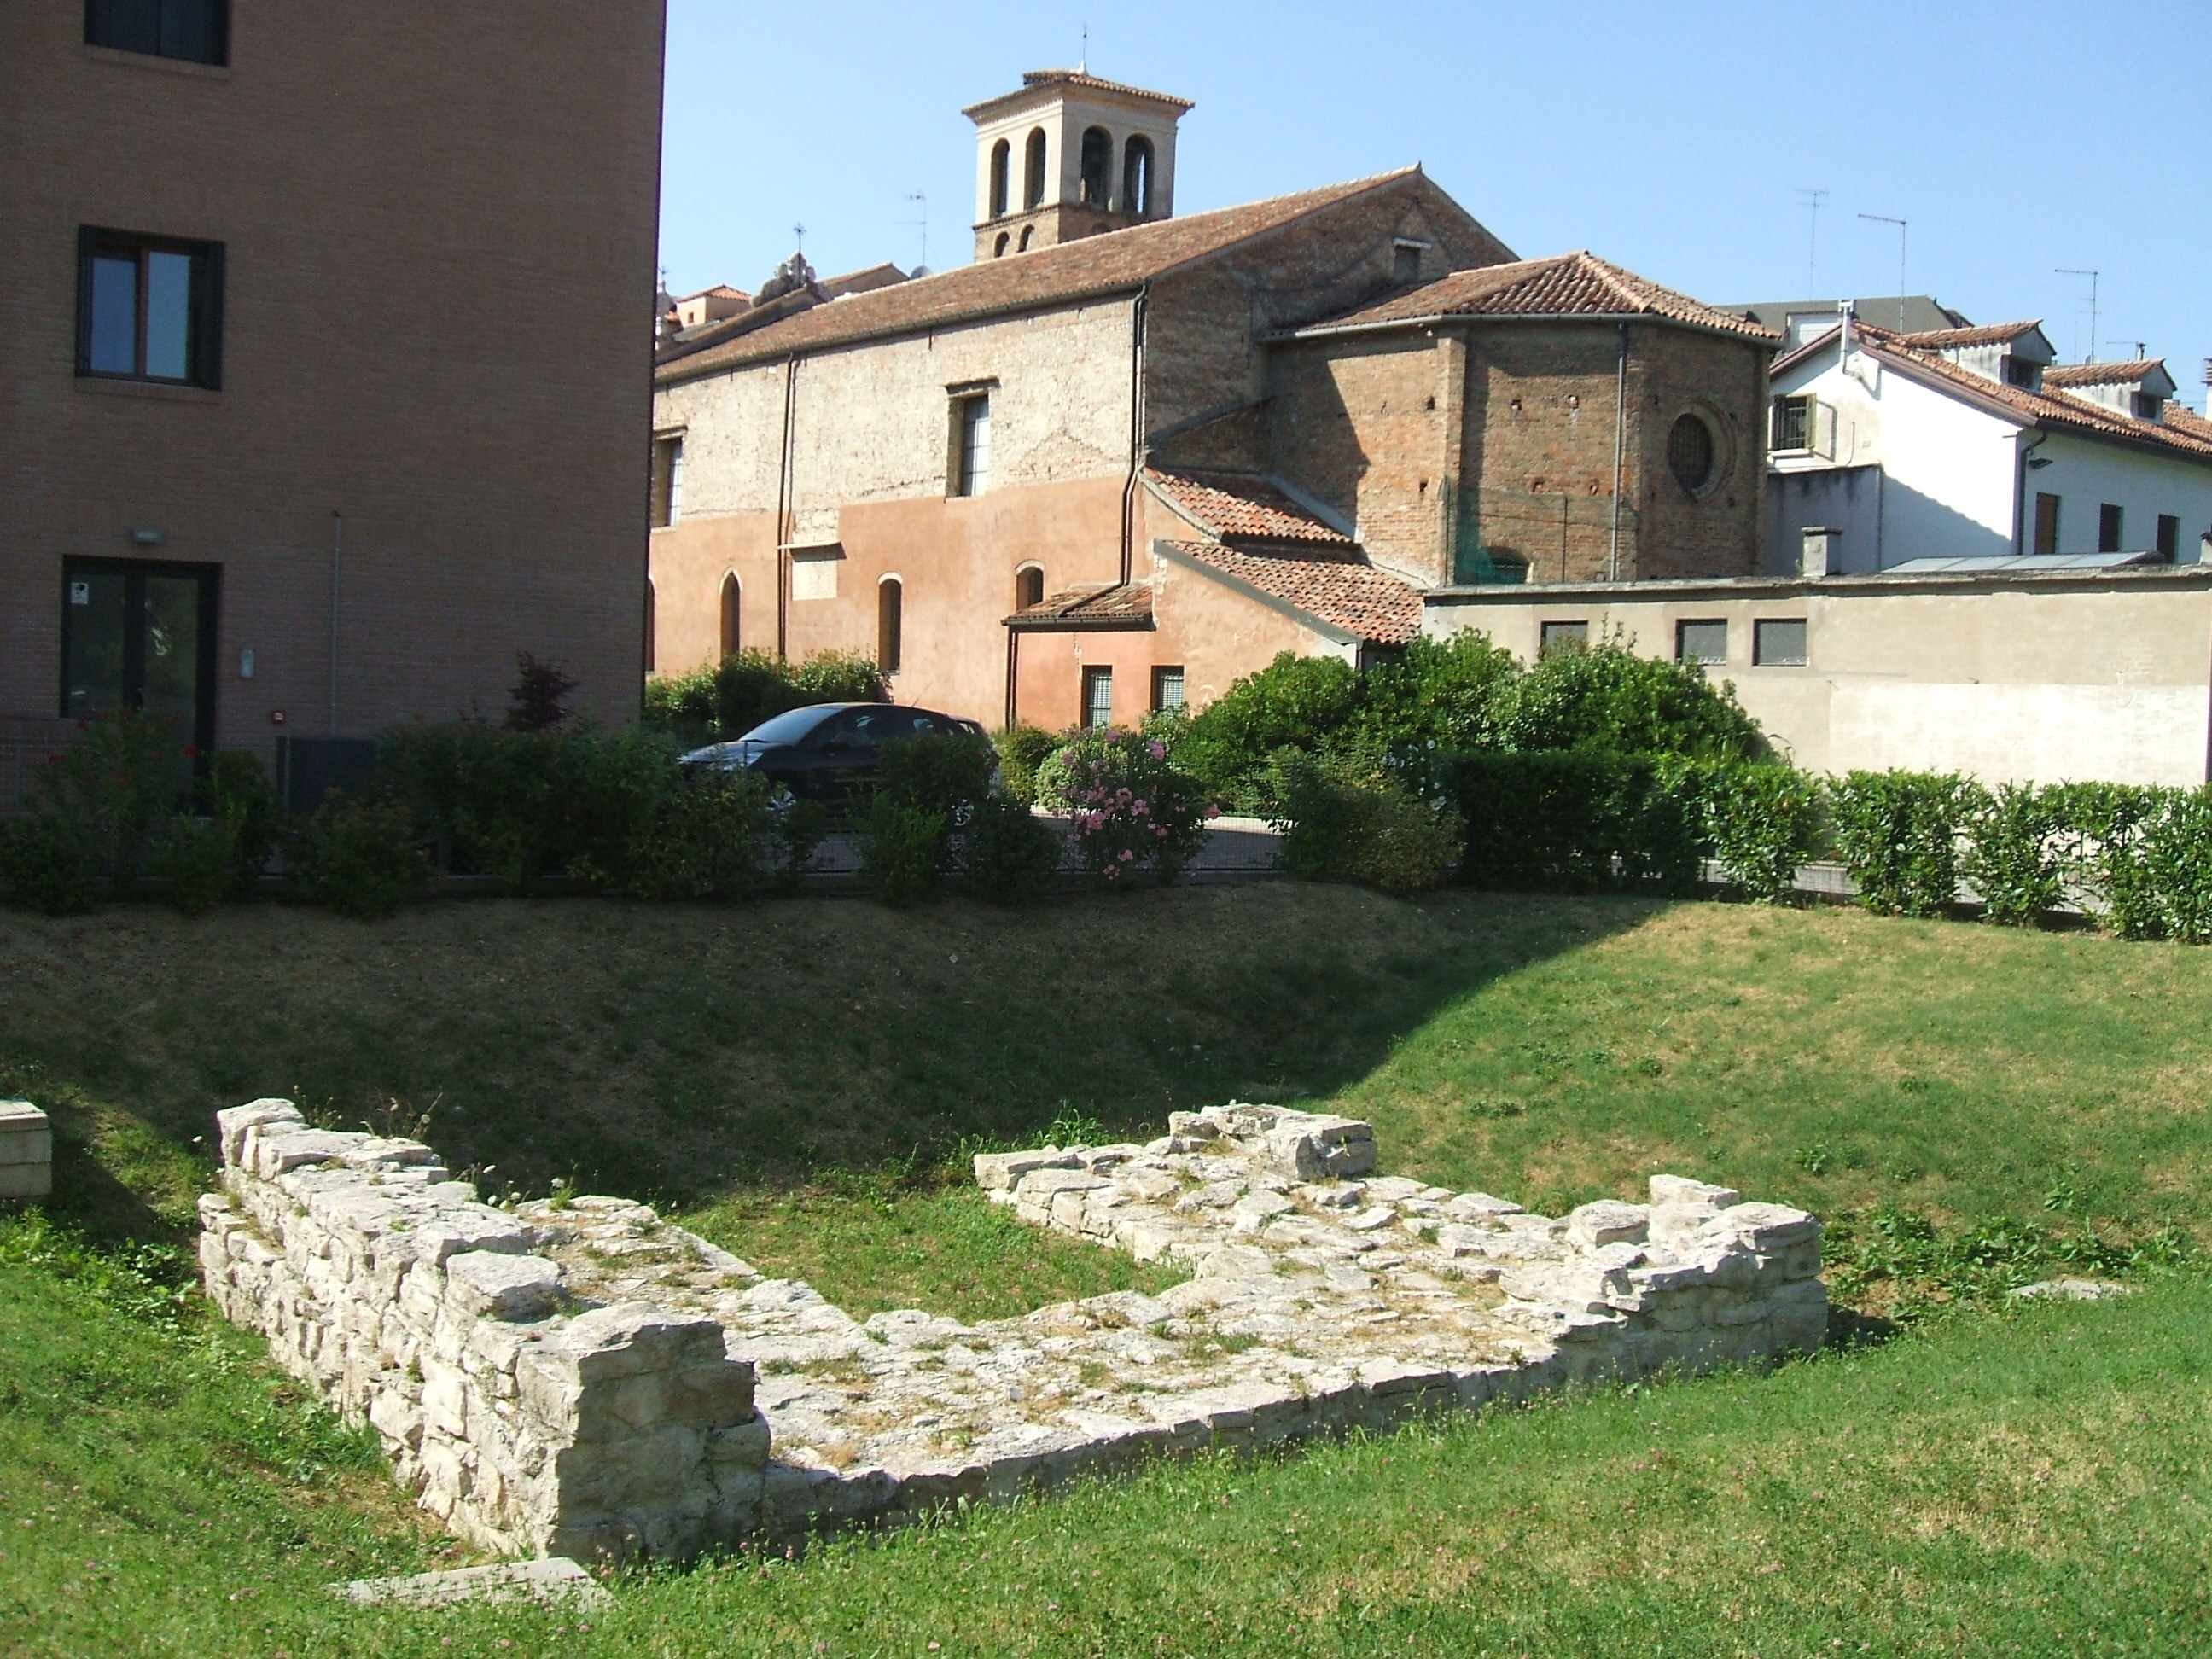 Torresino del XIV secolo in Parco Ponci a Mestre